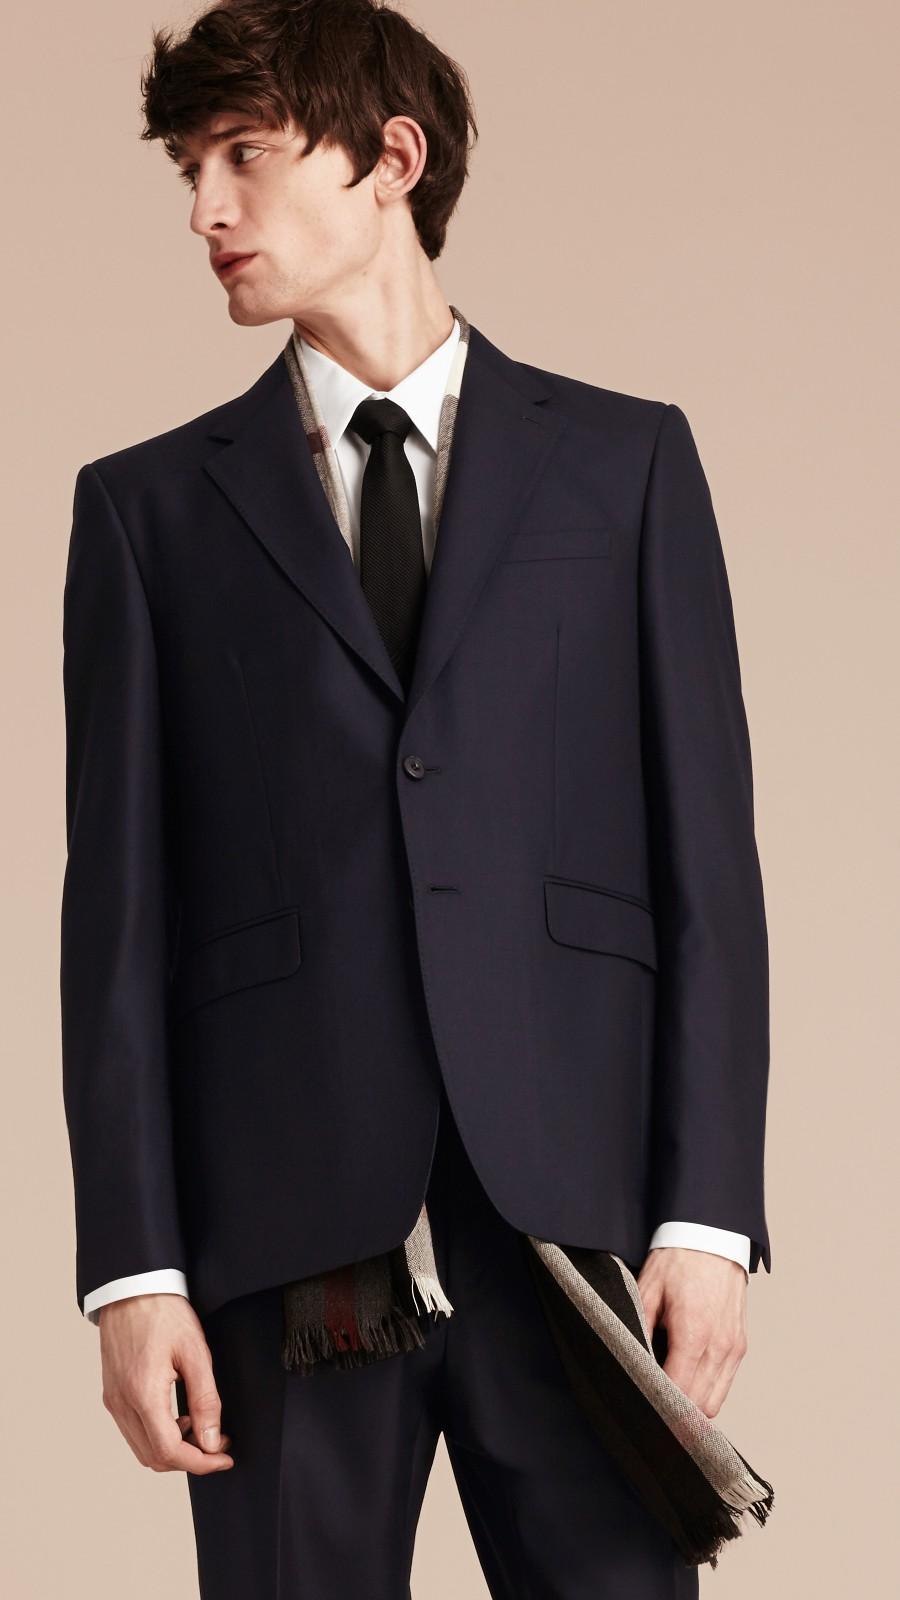 Navy Classic Fit Wool Part-canvas Suit Navy - Image 8